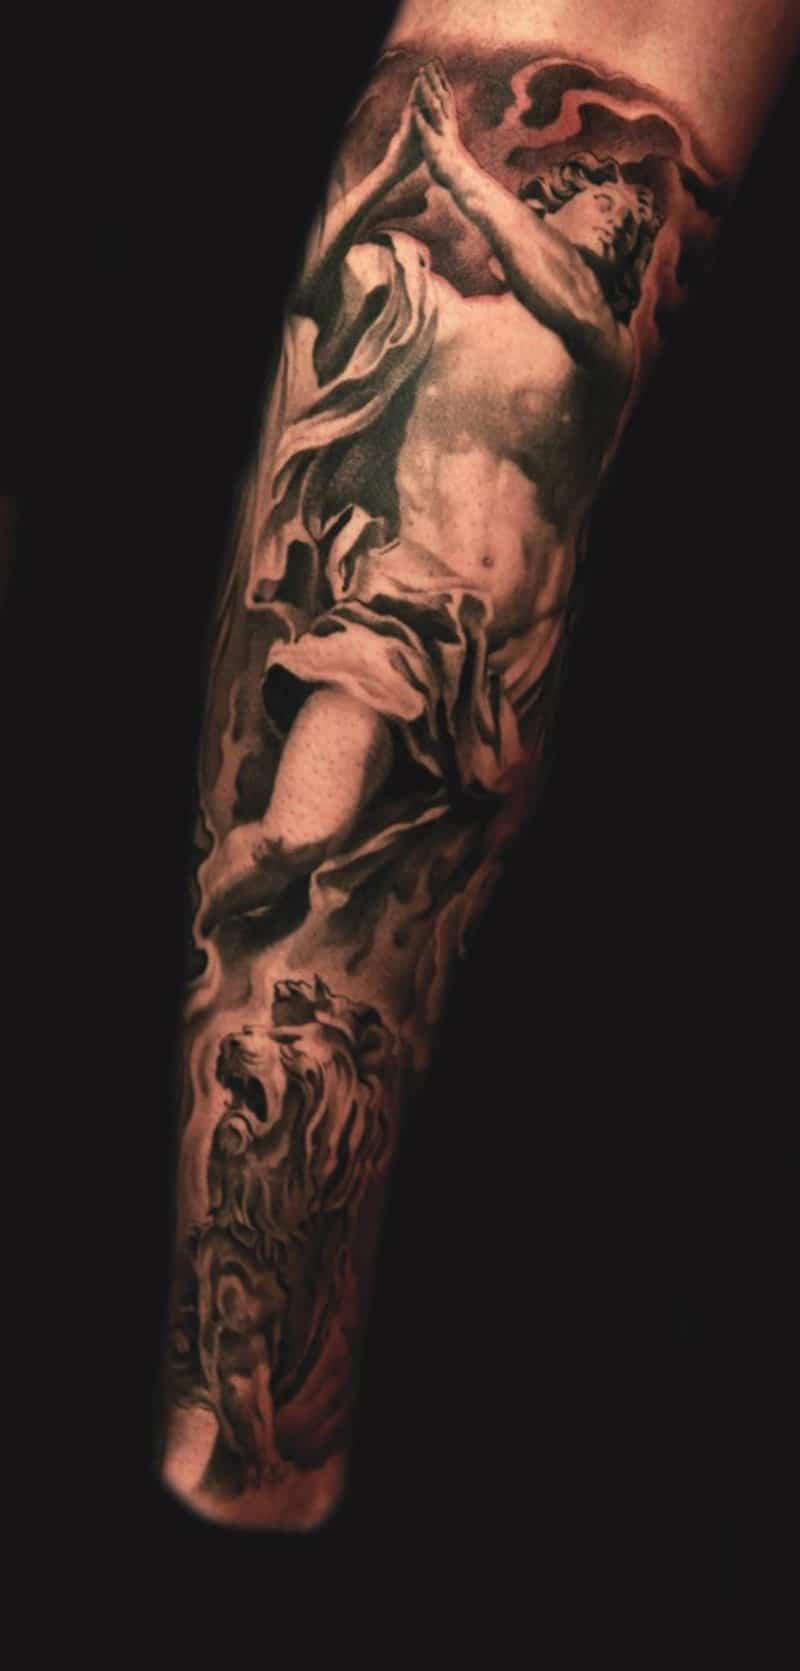 Un Tattoo Avec Un Dieu Grec Inkage